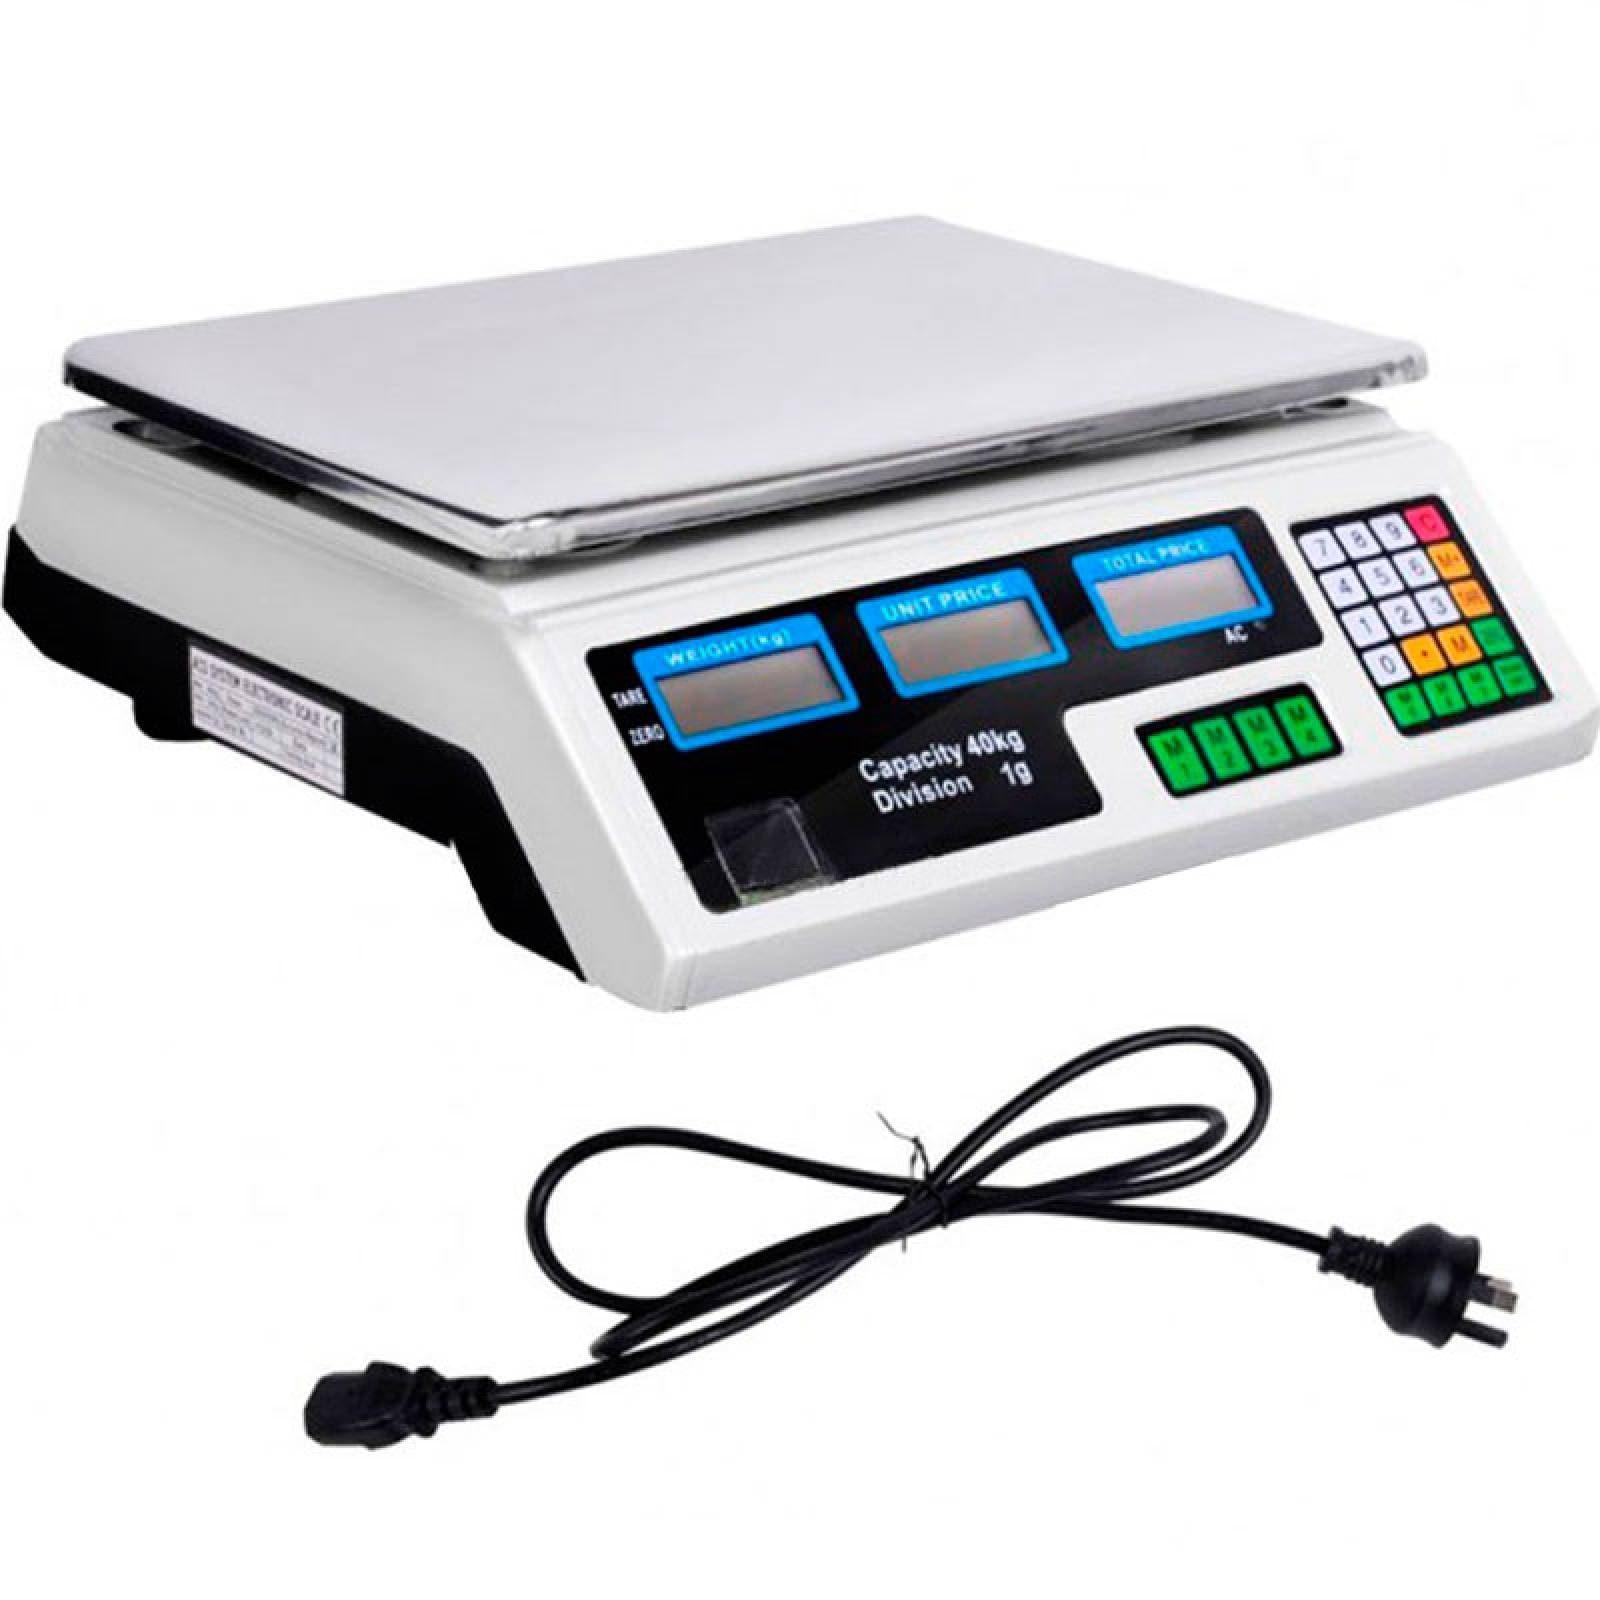 Bascula Digital Electronica 40 Kg Cocina Comercio Negocio Peso